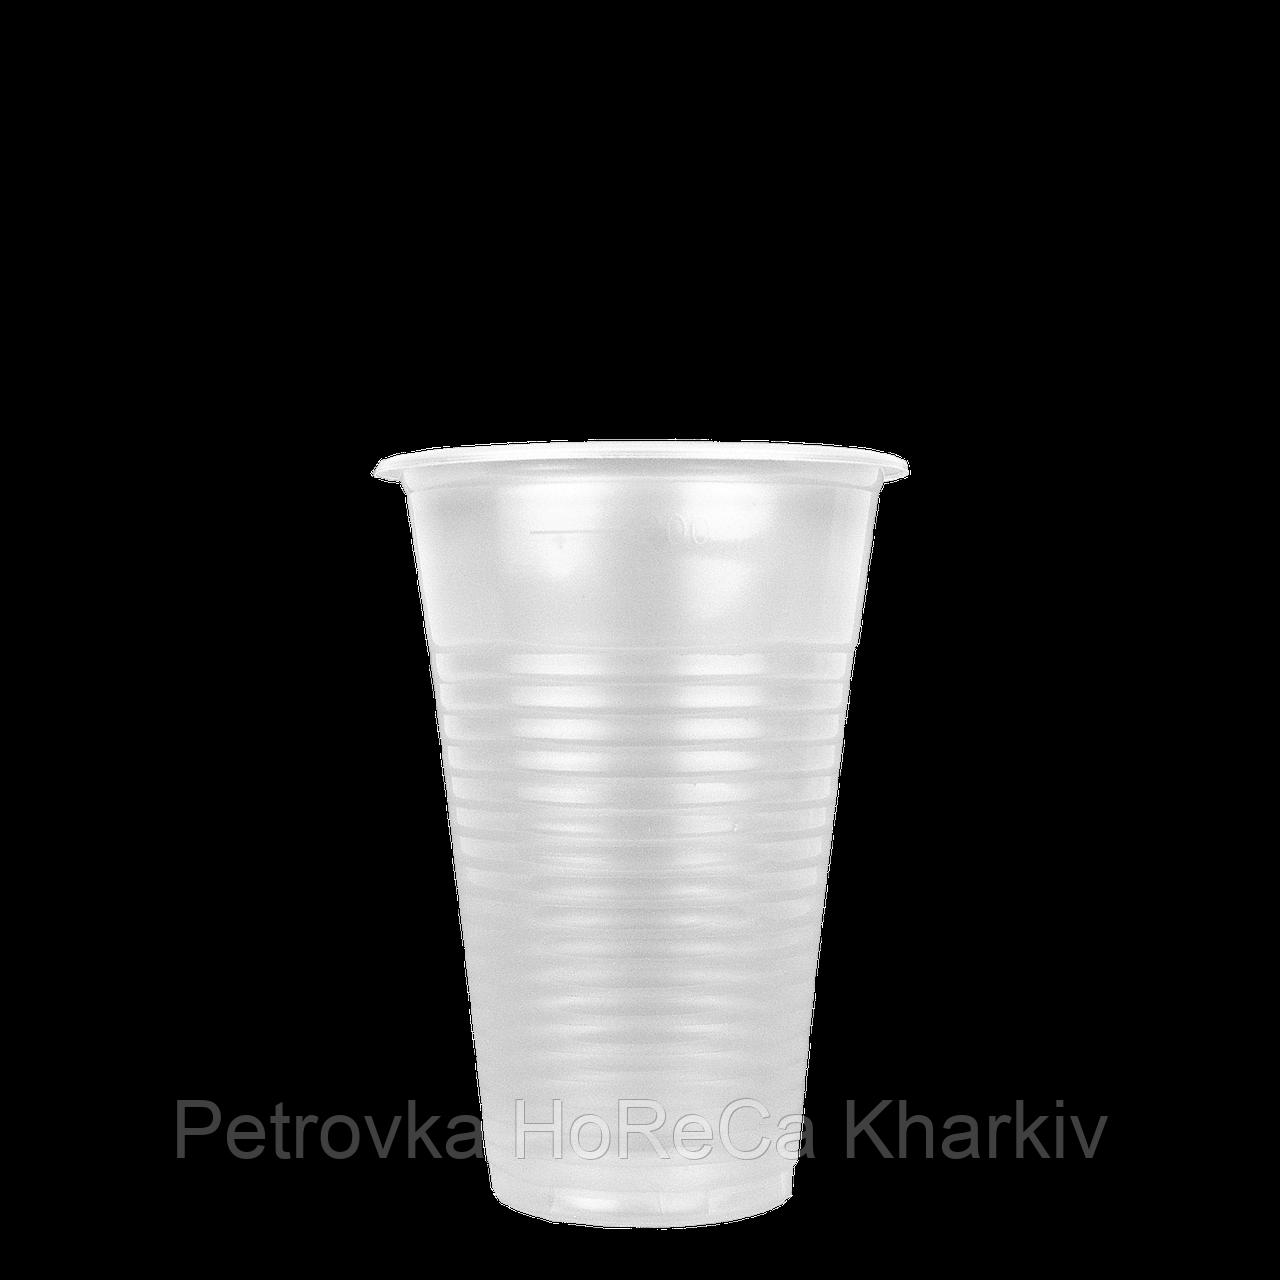 "Пластиковые стаканы 200мл ""Еxclusive"" 1уп/100шт"